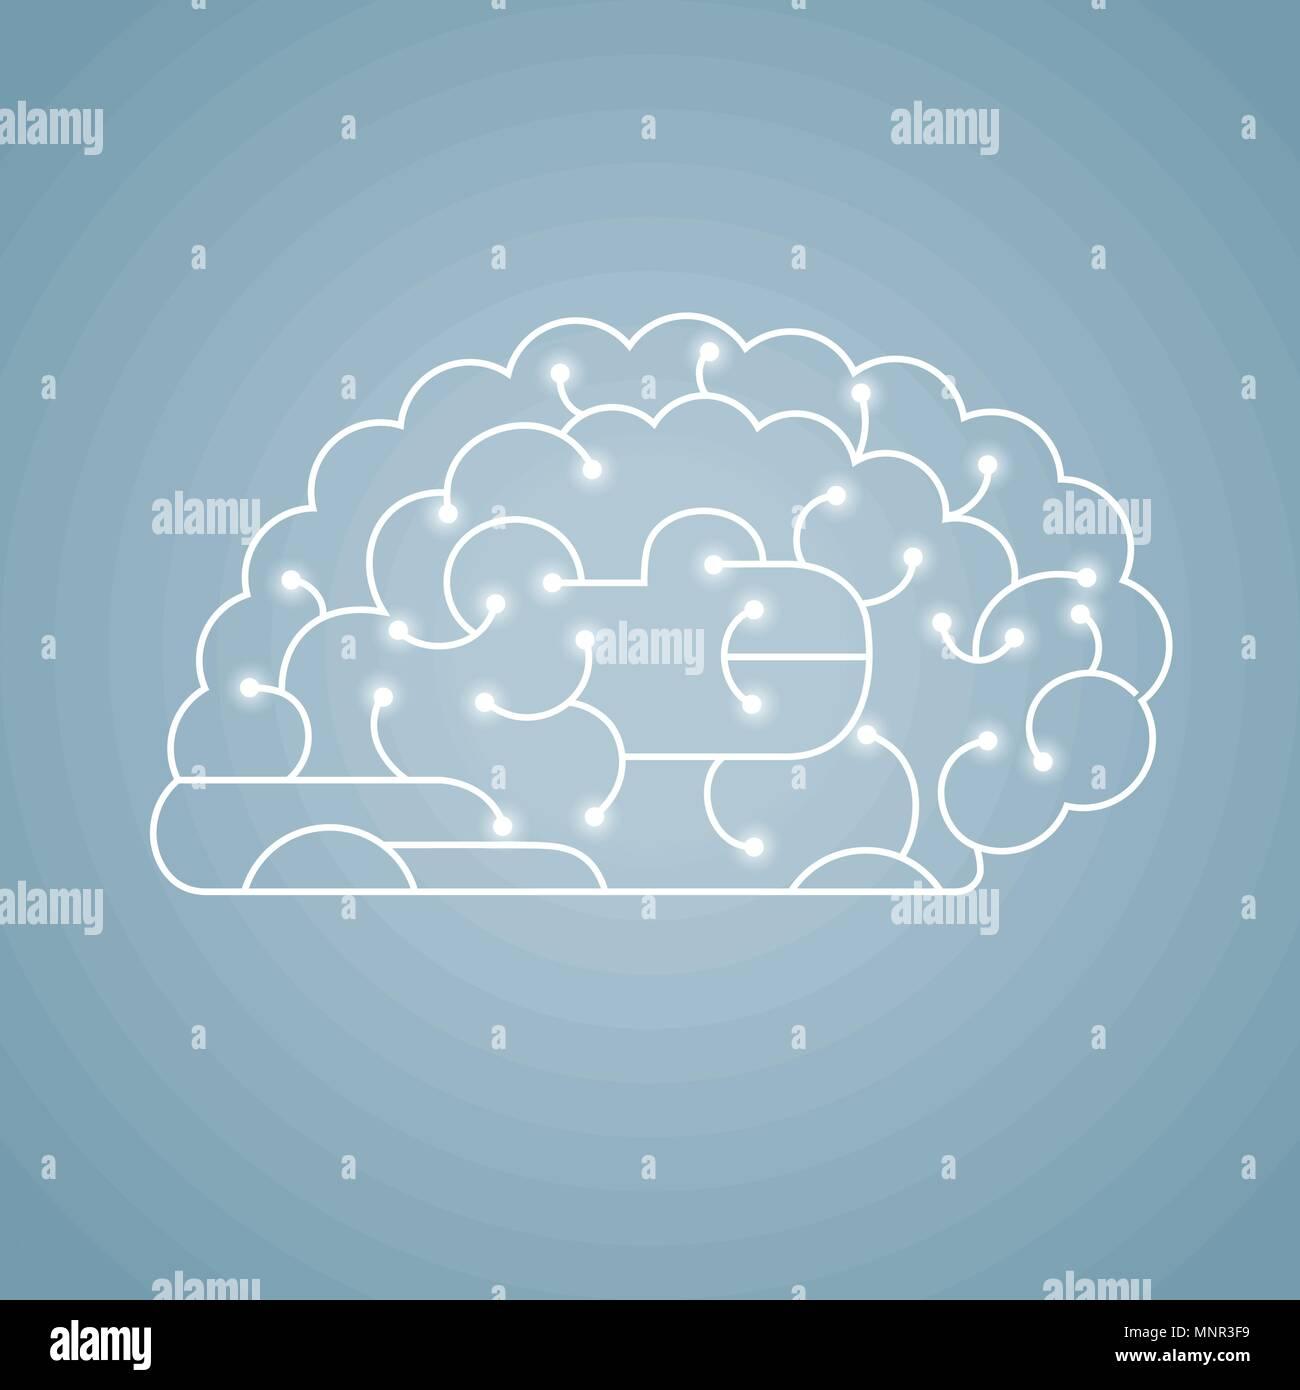 Vector drawn brain graphic - Stock Image